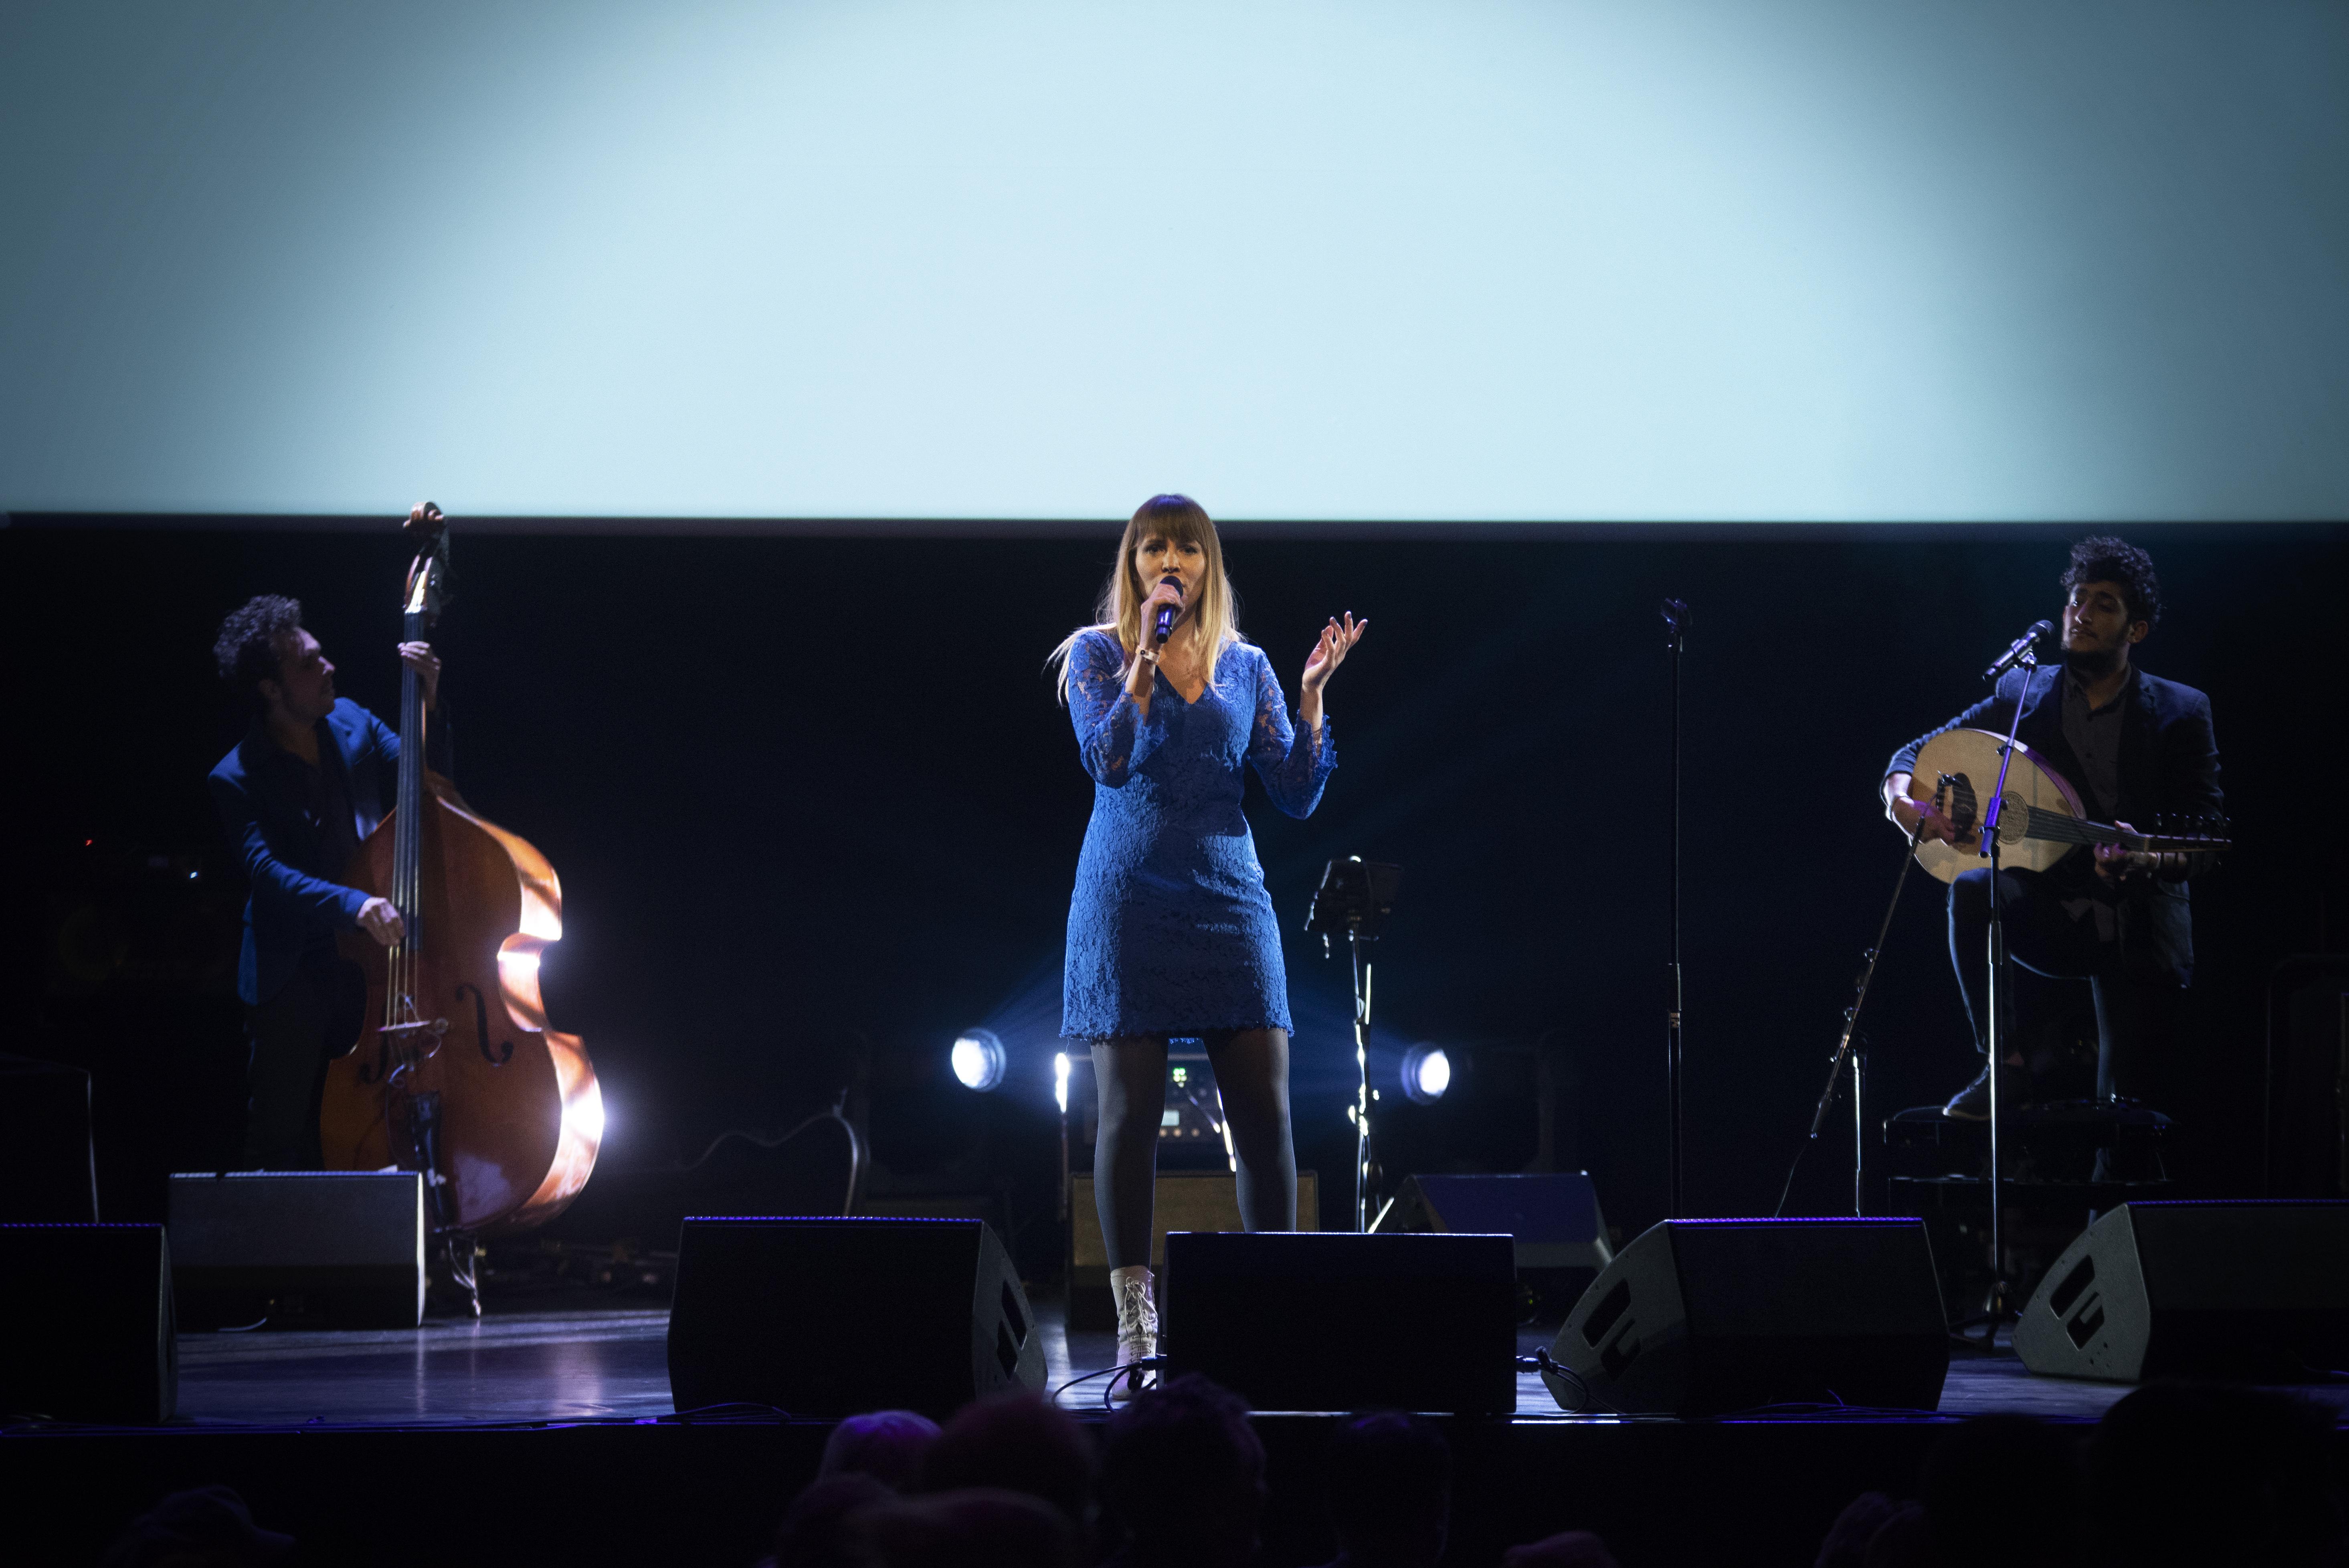 Wende tijdens Buma NL Awards 2018 - Fotocredits: Shali Blok (Artiestennieuws)